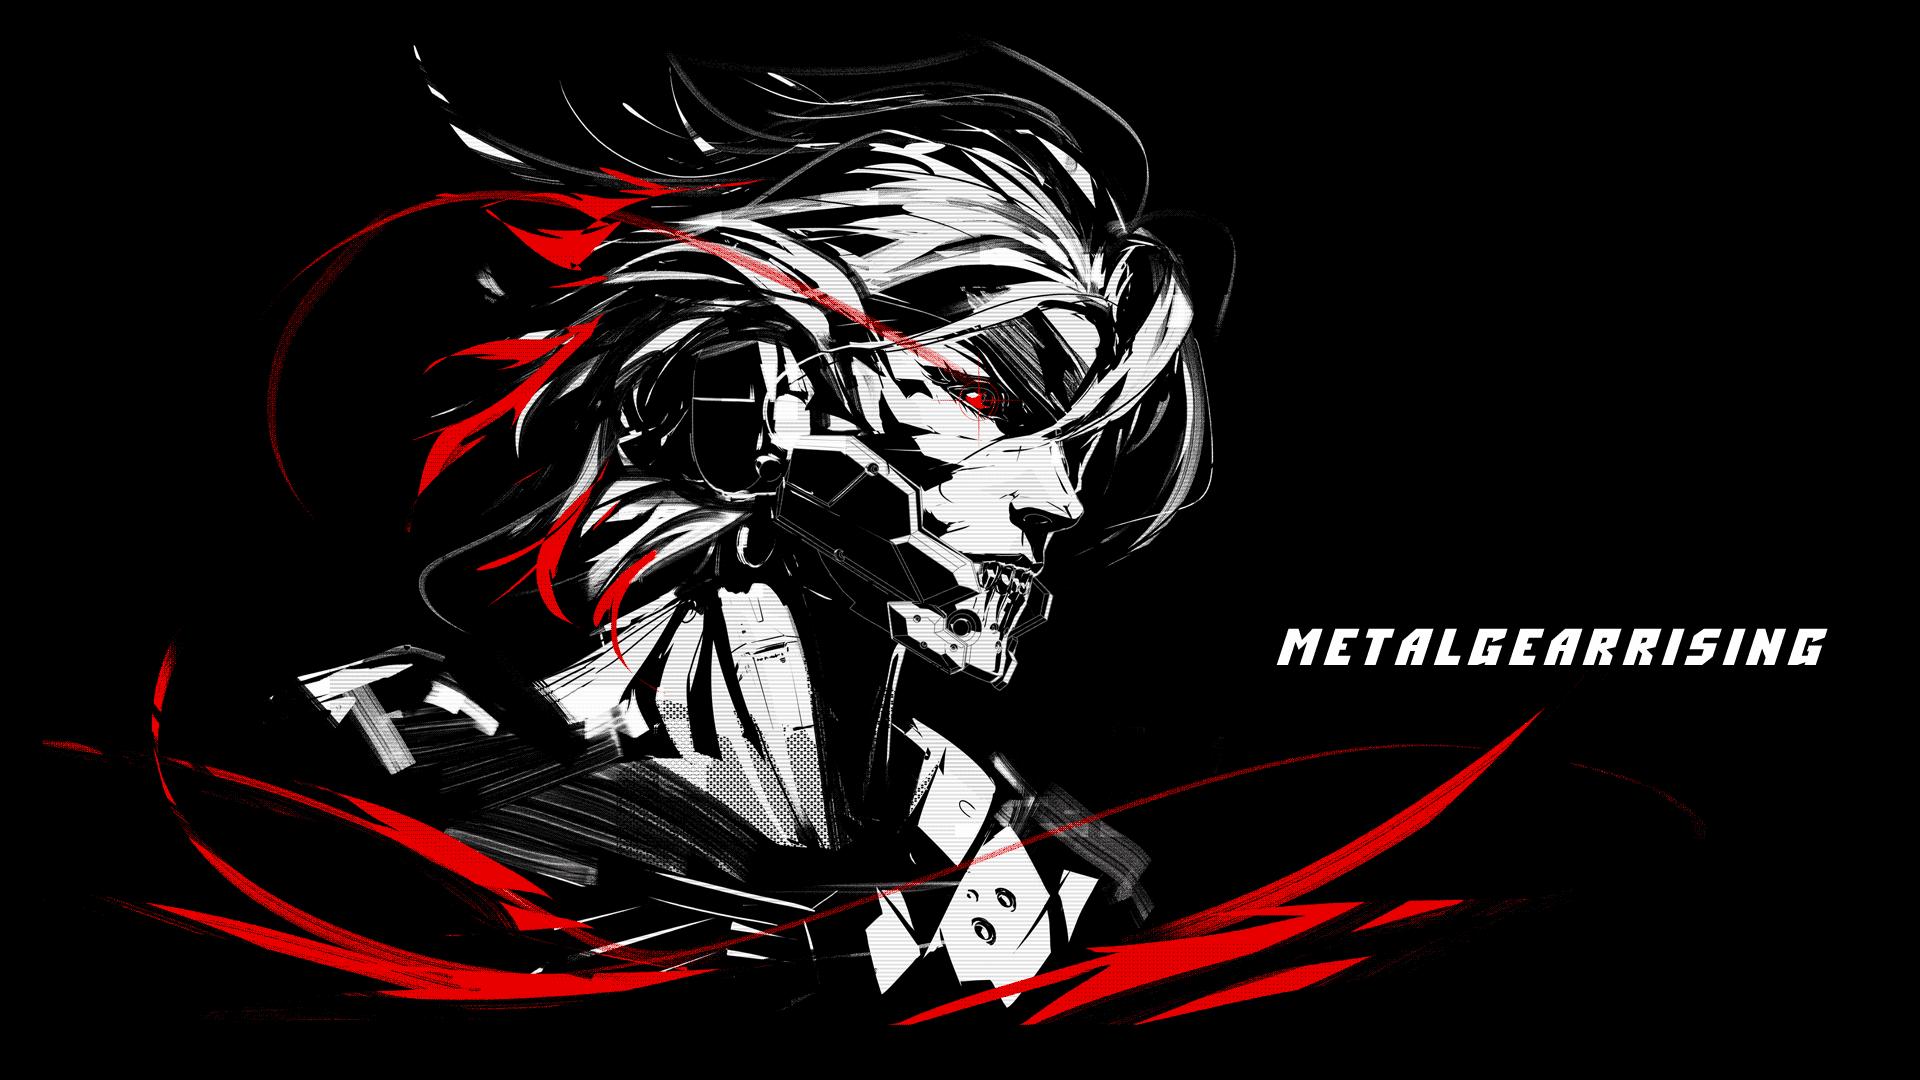 General 1920x1080 Raiden Metal Gear Rising: Revengeance video games video game art simple background black background